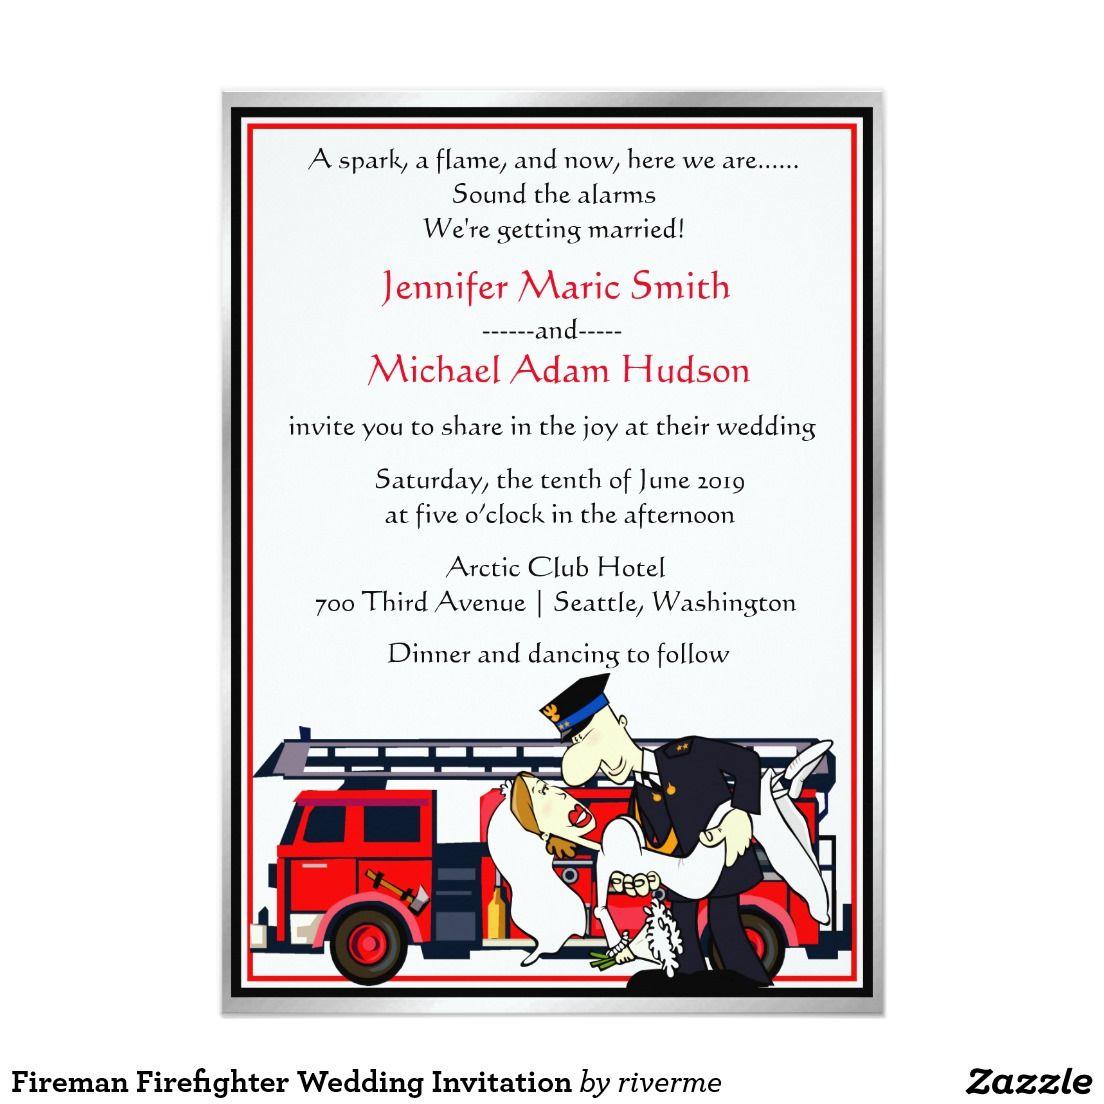 Fireman Firefighter Wedding Invitation | Firemen, Firefighter and ...